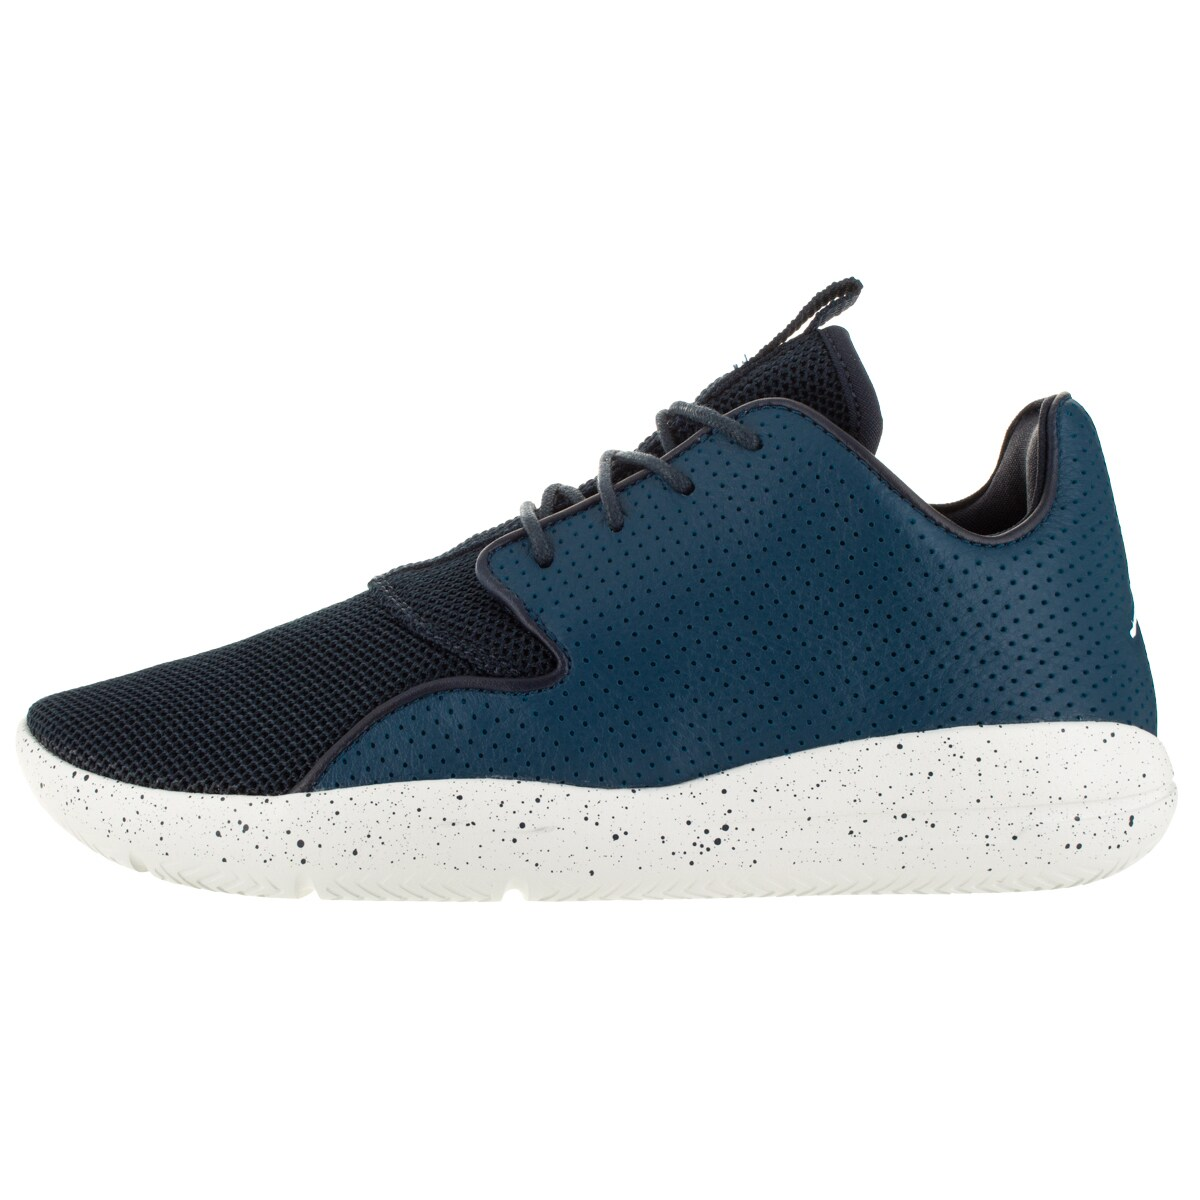 3ebb3351ef4 Shop Nike Jordan Kid s Jordan Eclipse Bg Fch Bl White Obsdn  Running ...